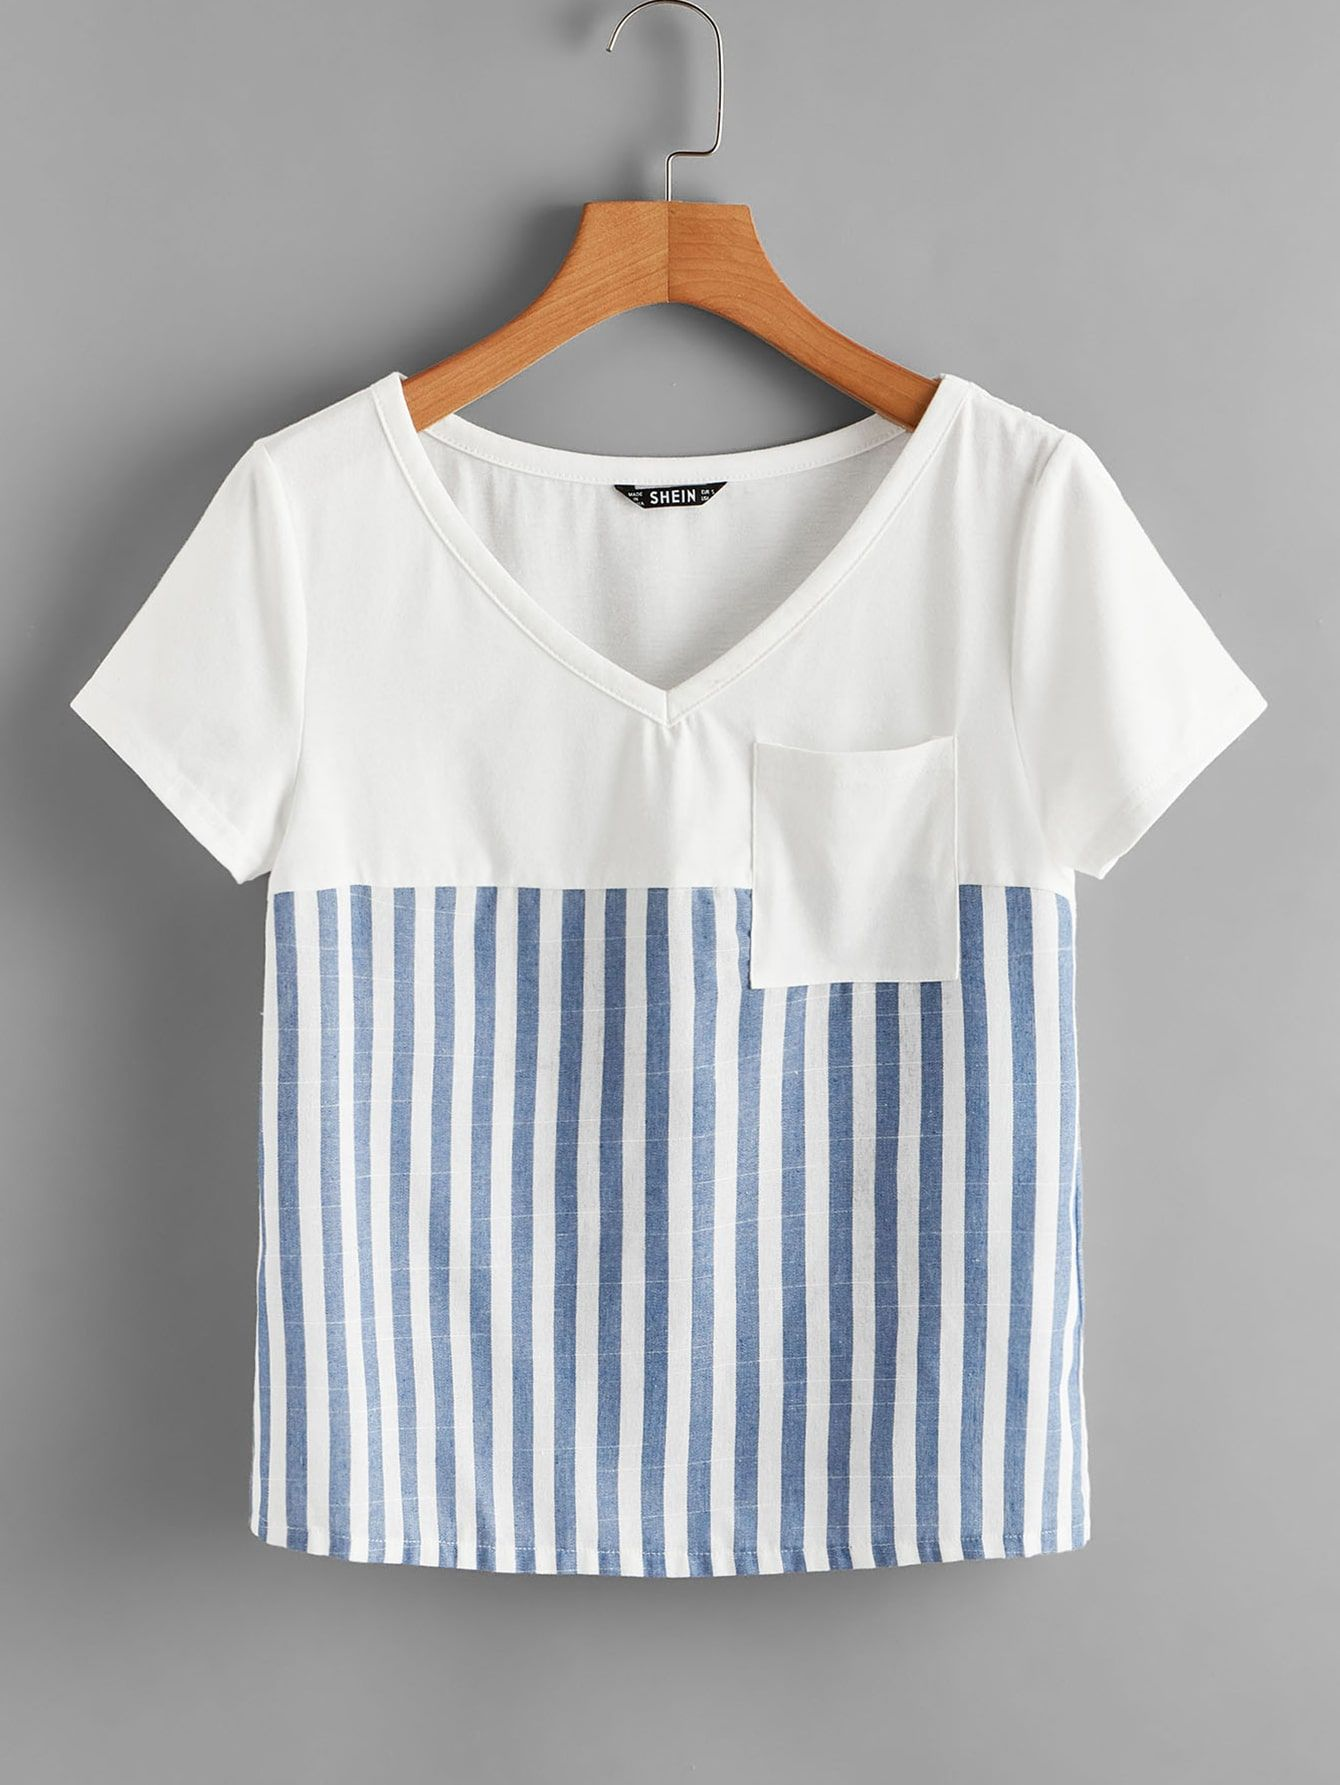 T Shirty Kieszen W Paski Wielokolorowe Codzienny Moda T Shirty Kieszen W Paski Wielokolorowe Codzienny Shein Polska Tops Women S Fashion Dresses Clothes